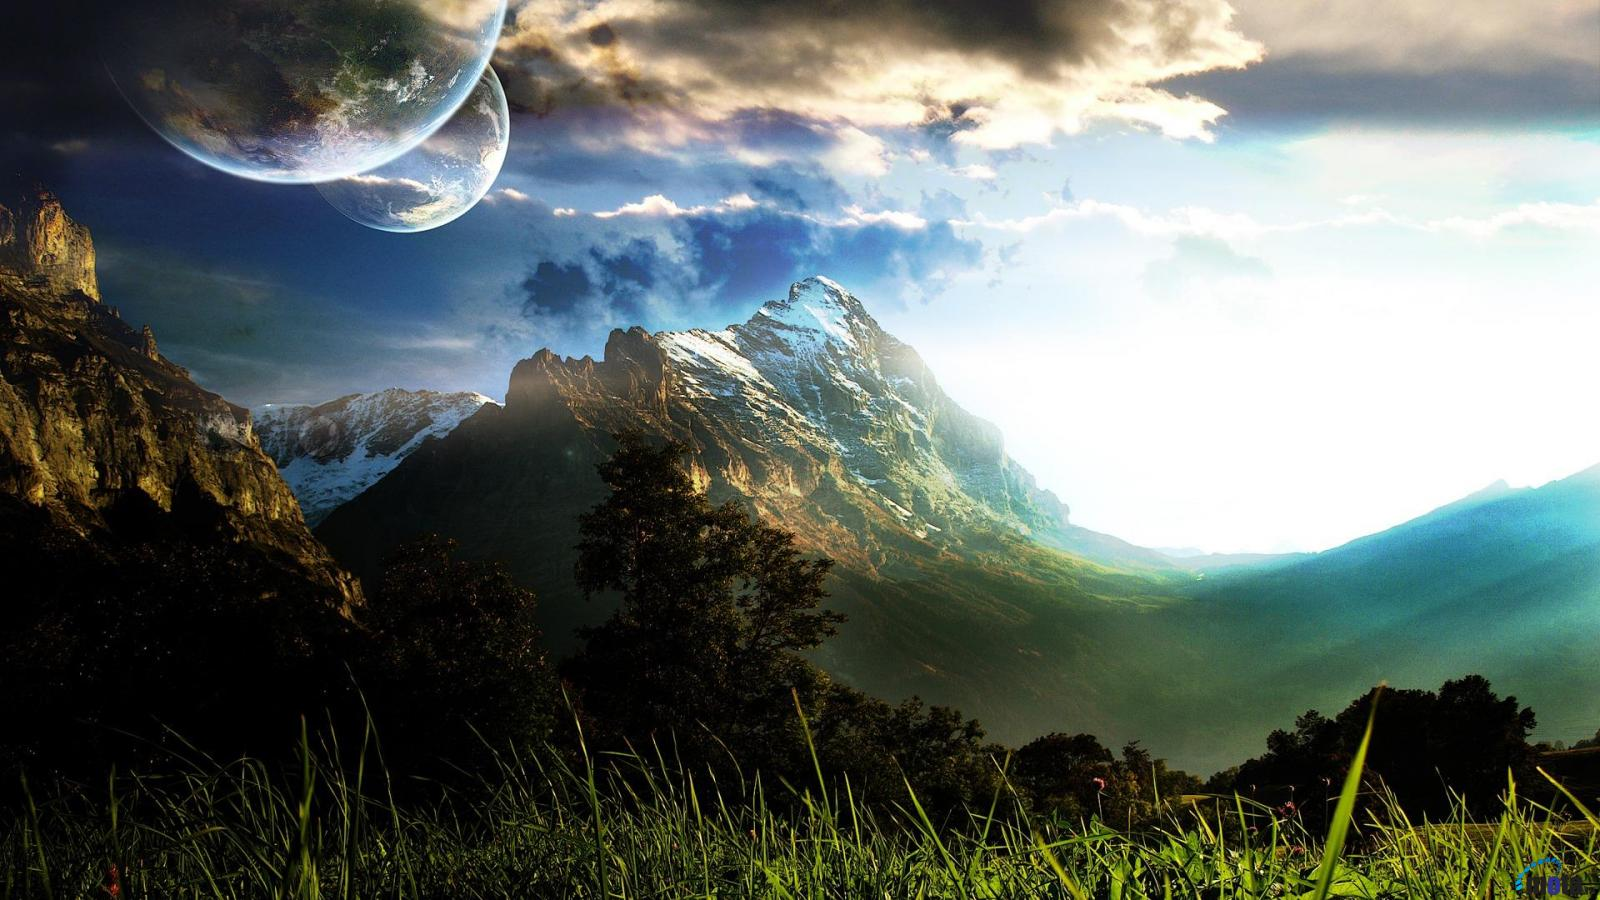 epic landscapes landscape backgrounds wallpapers fantasy nature scenery background chillstep desktop 3d screen